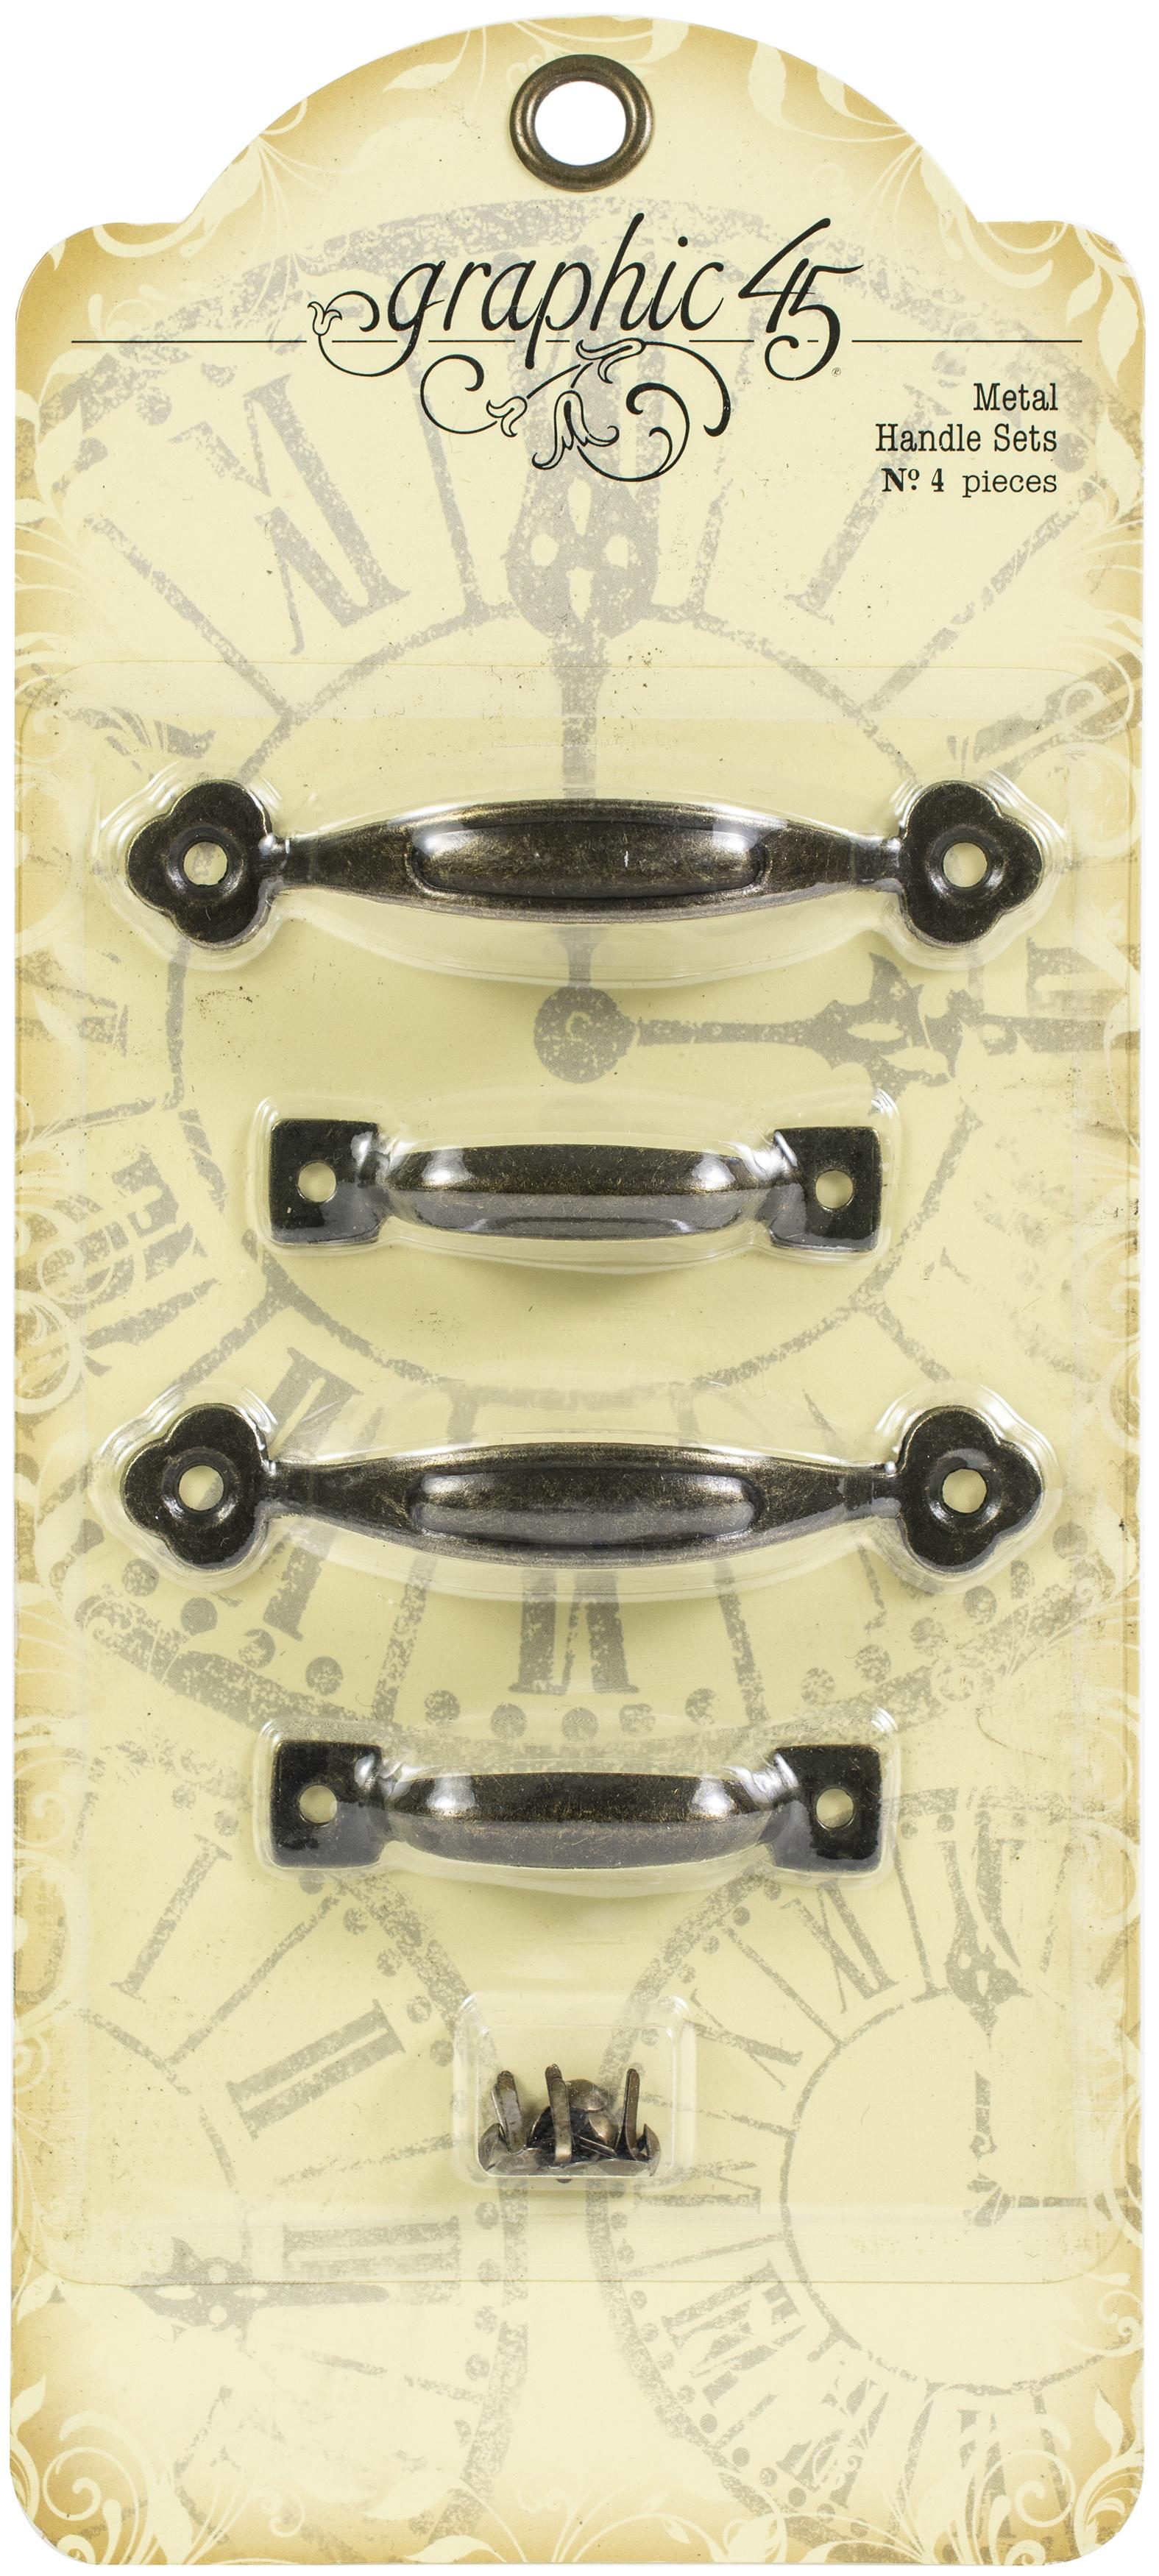 Graphic 45 Staples Metal Handle Set-